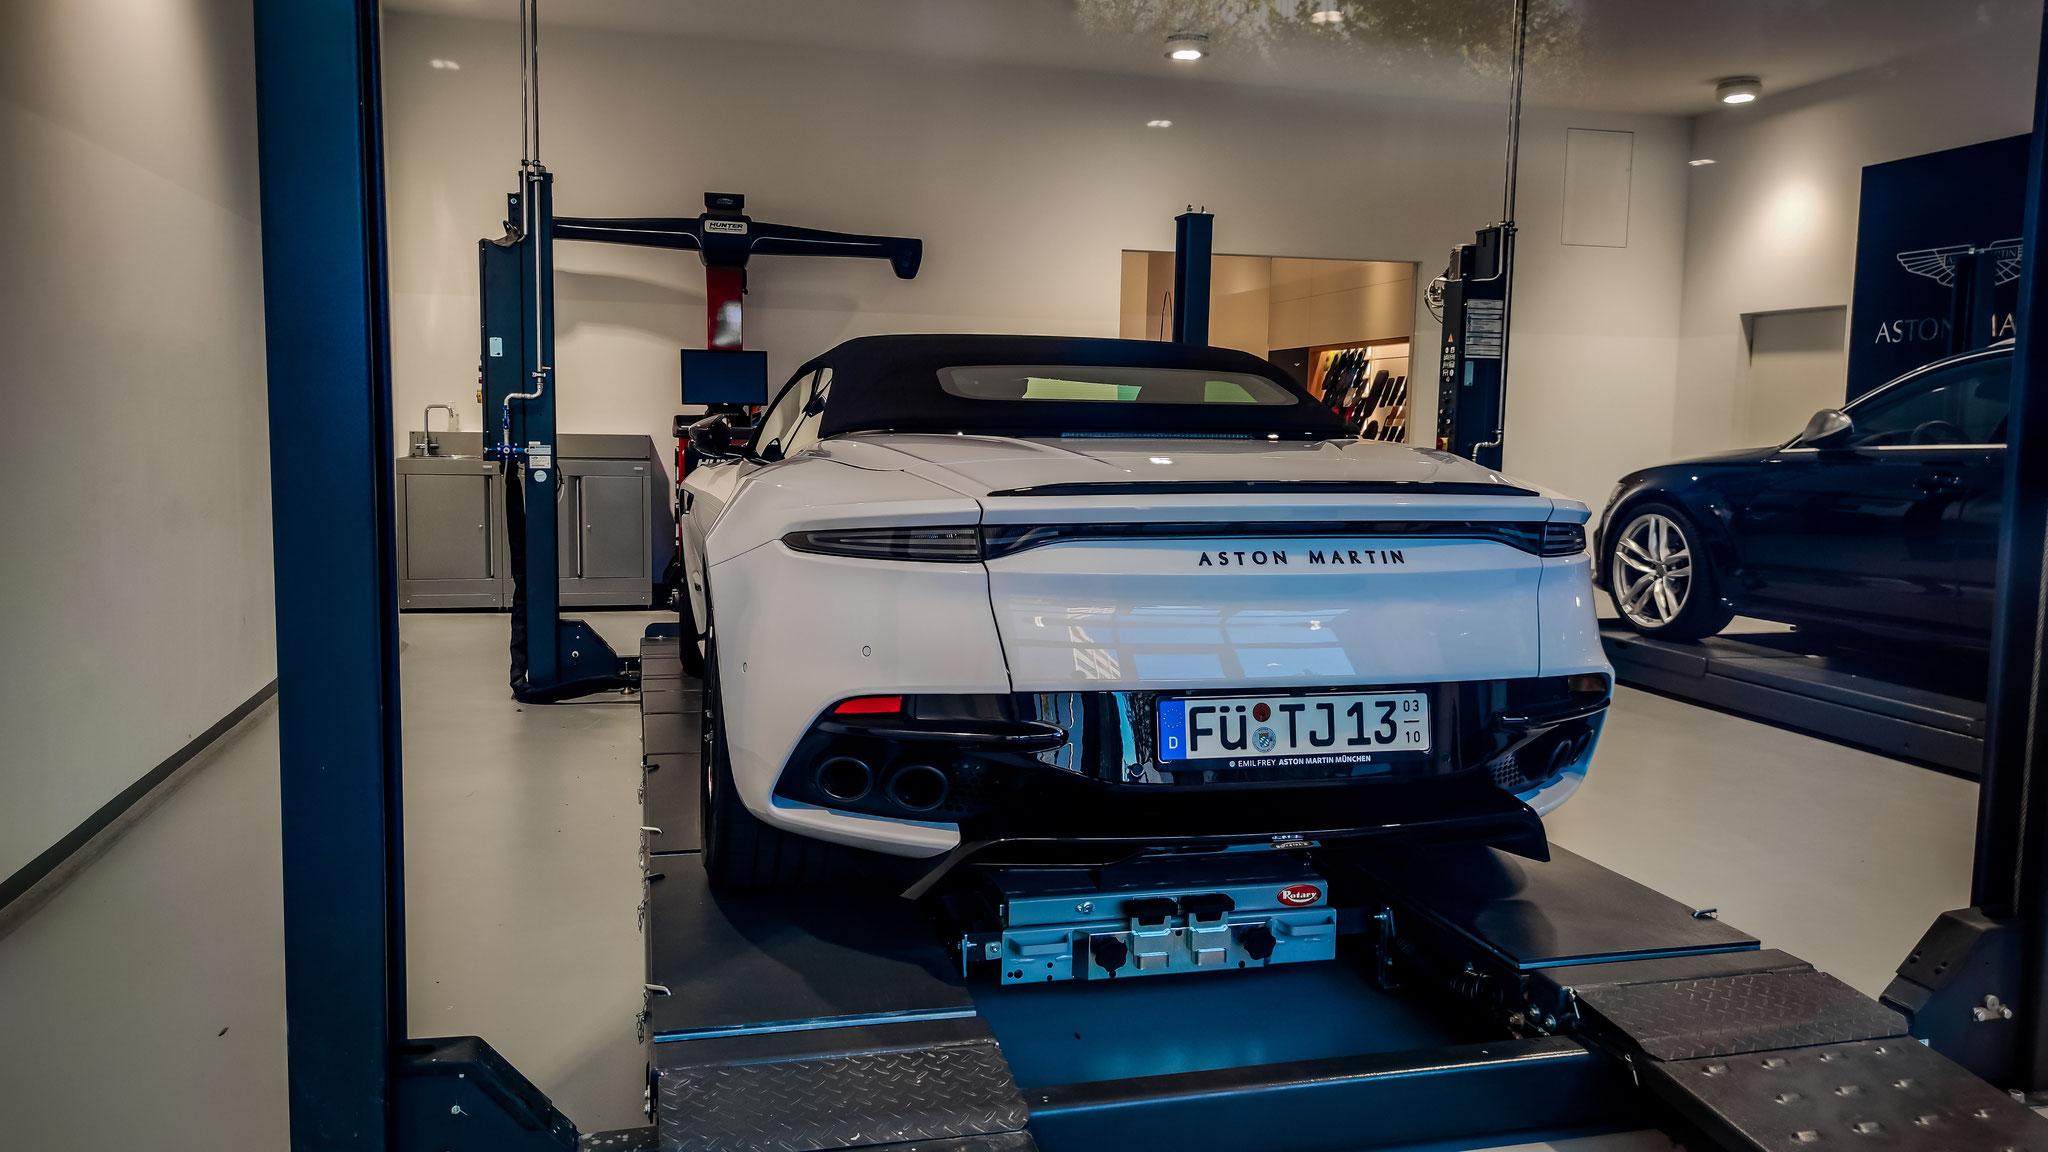 Aston Martin DBS Superleggera Volante - FÜ-TJ-13